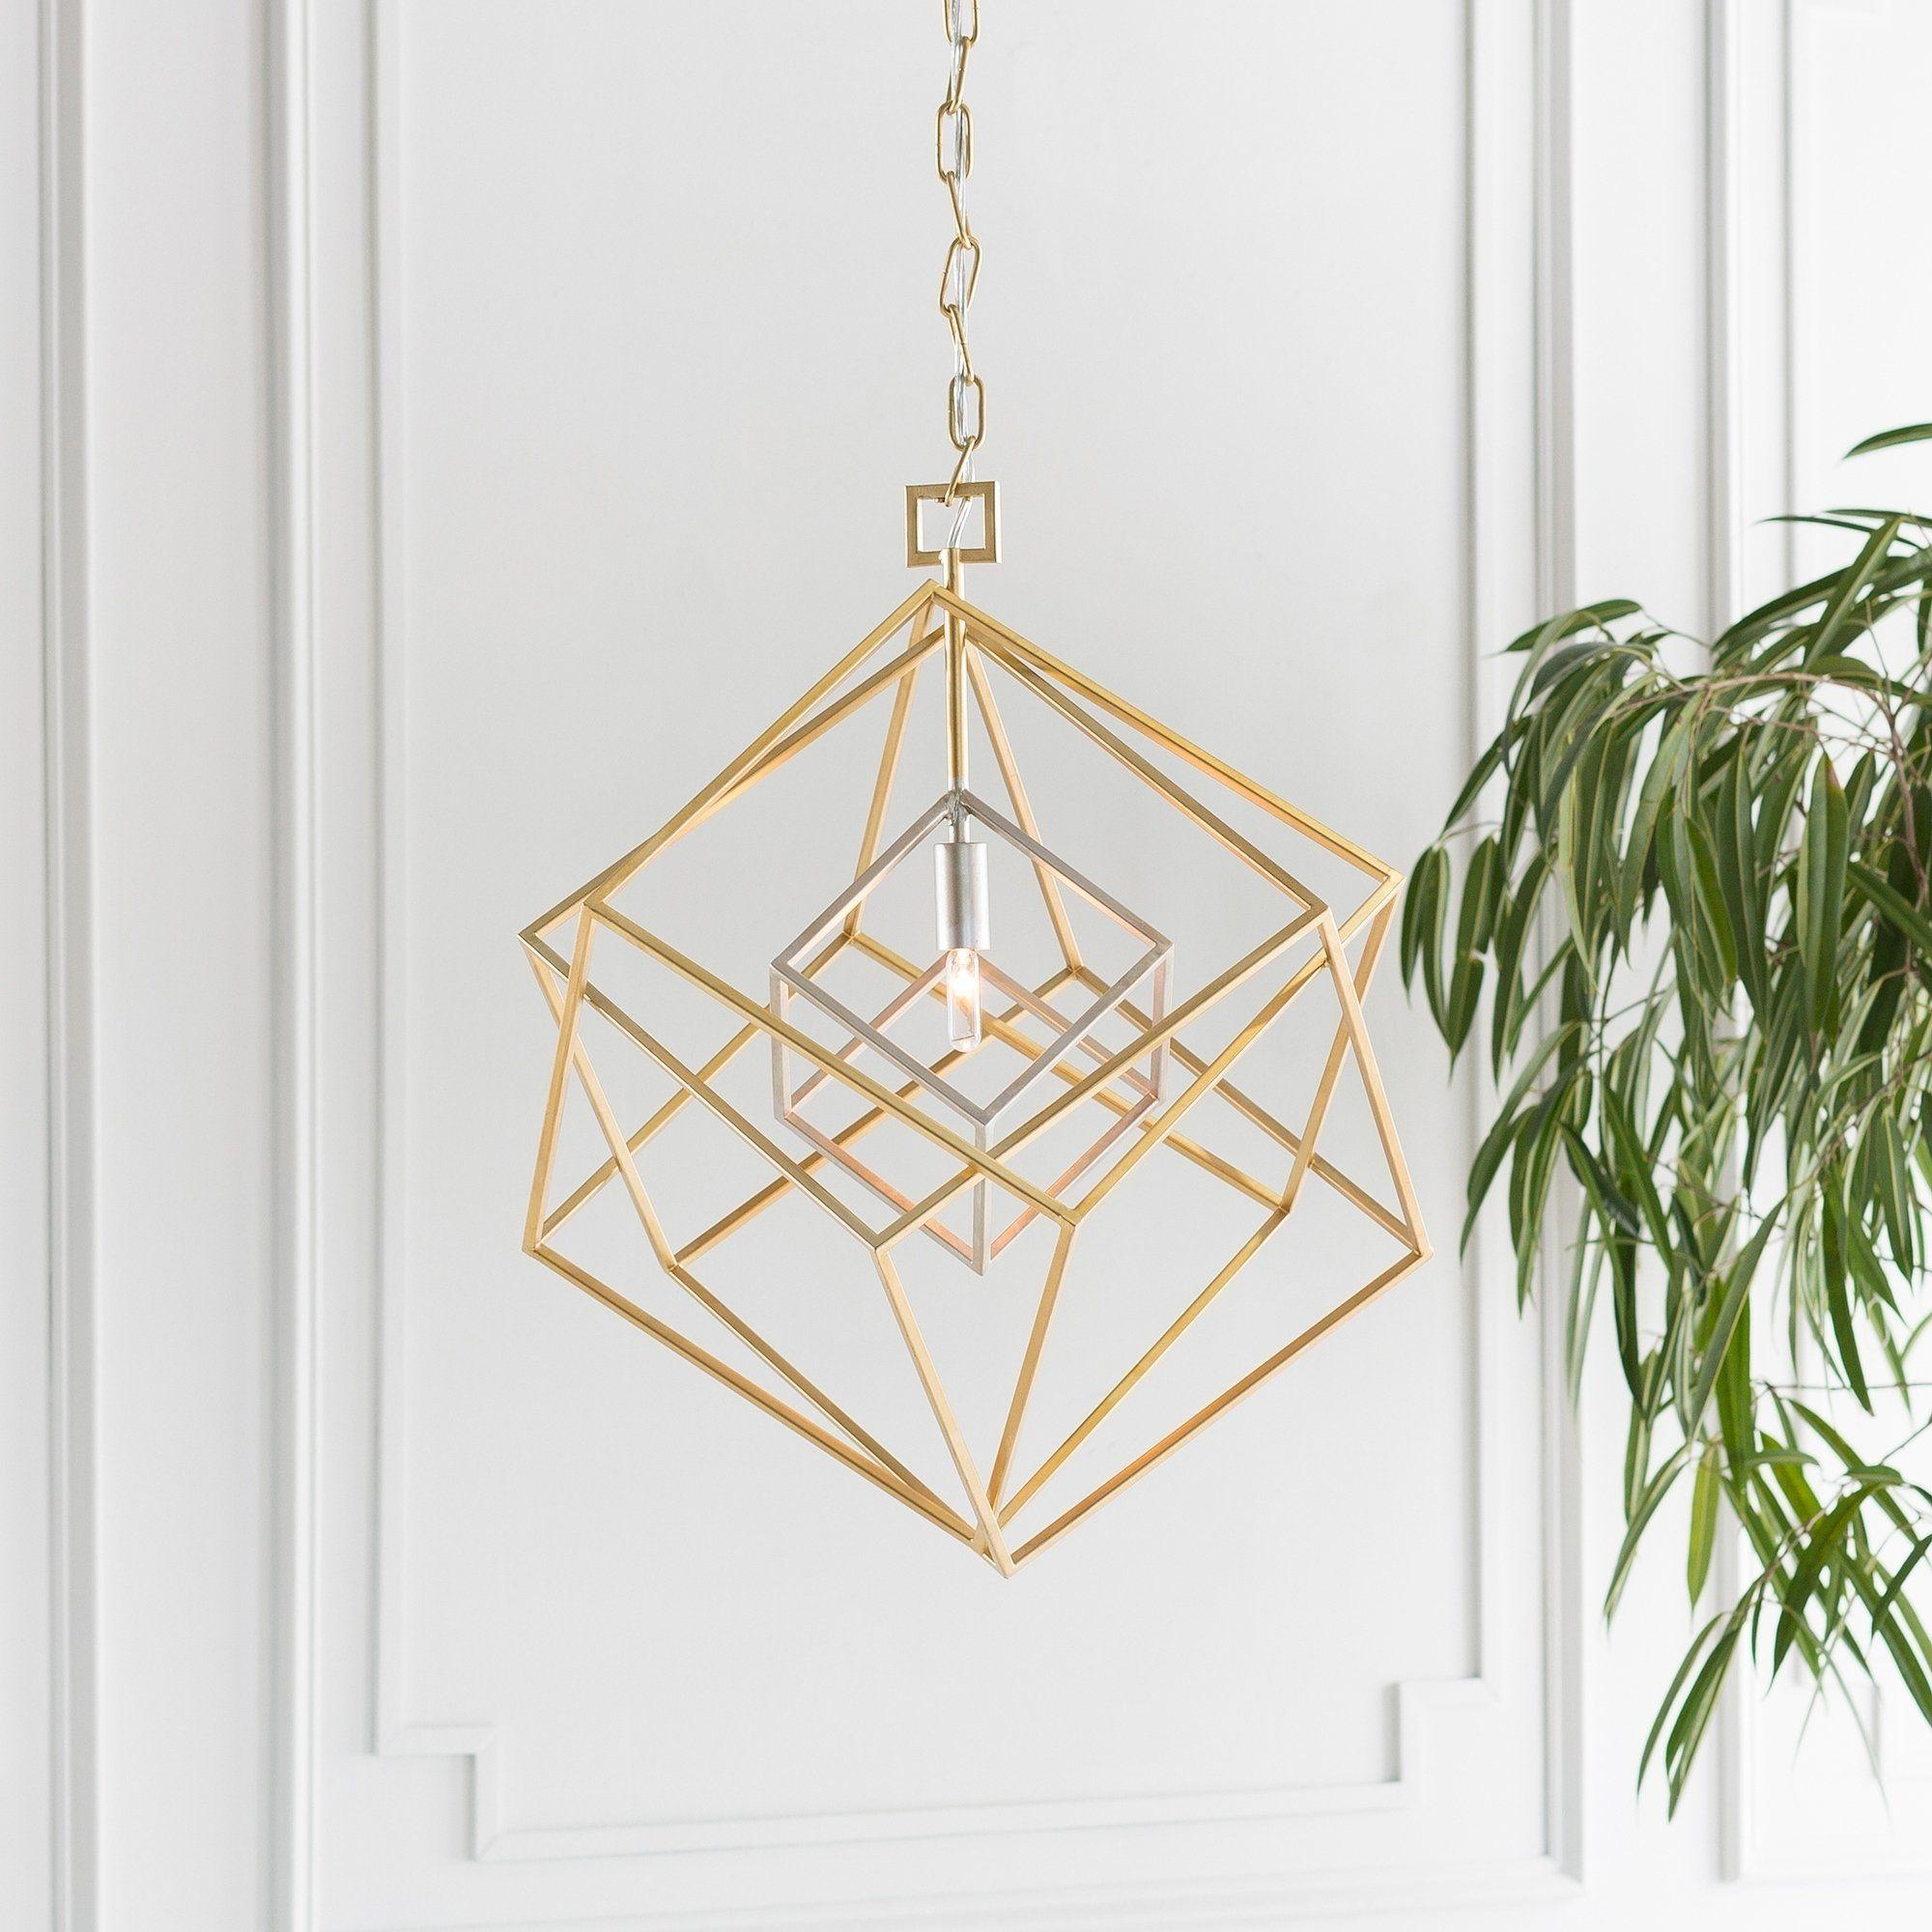 Mccallum modern gold pendant lighting fixture in 2019 products